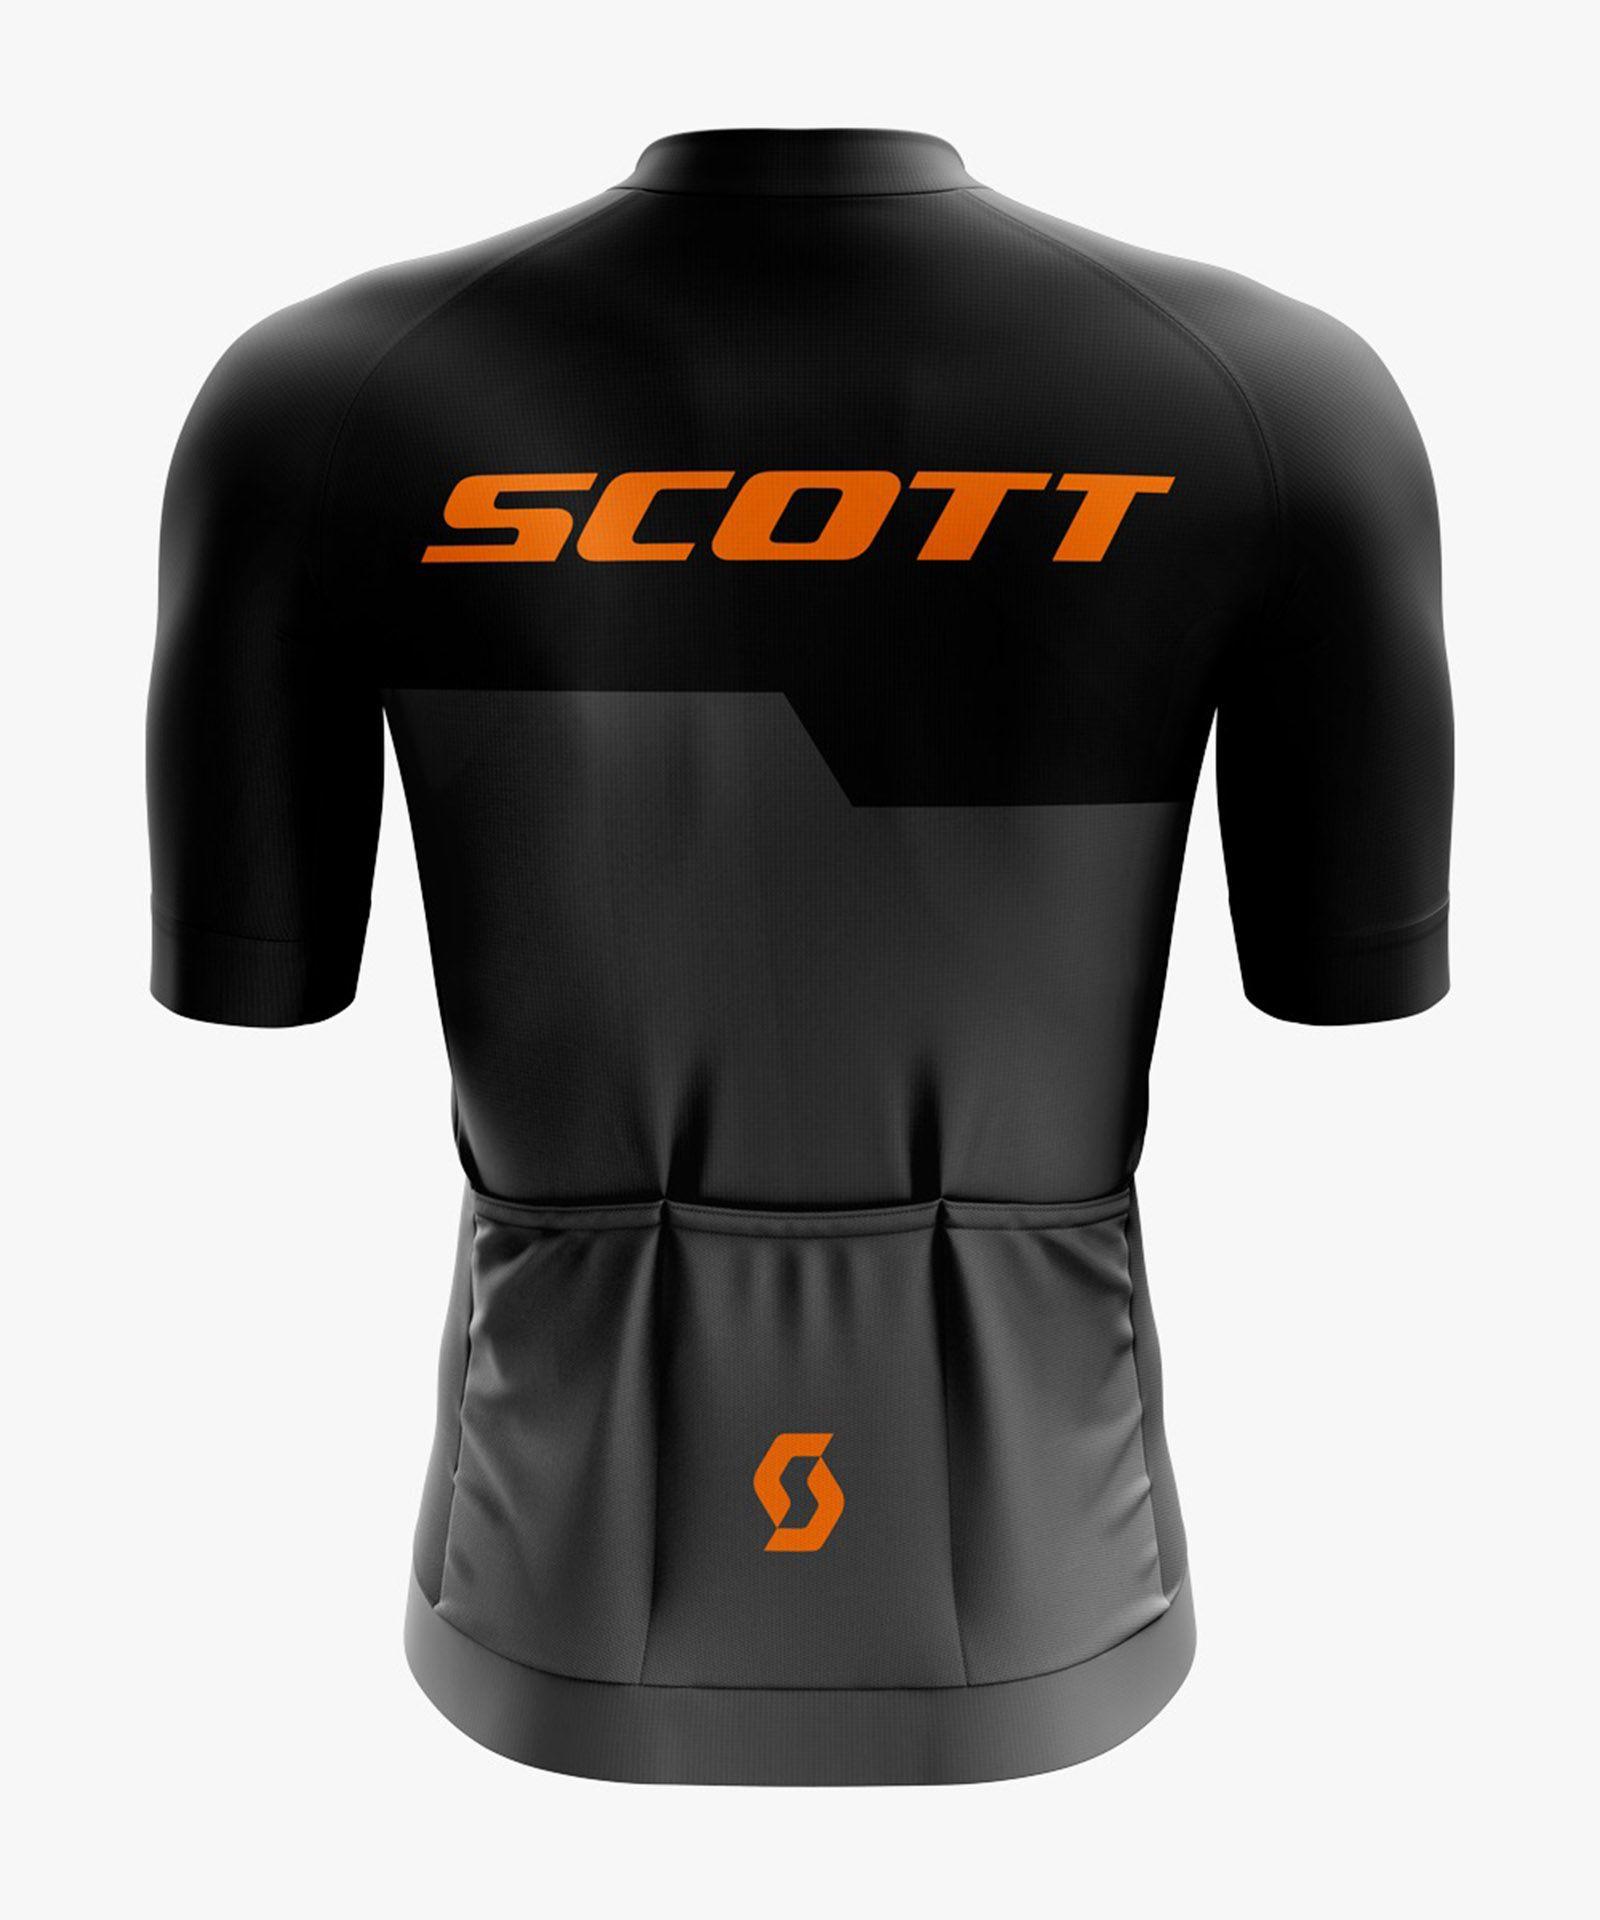 Camiseta Masculina Scott Preto/Laranja - Refactor